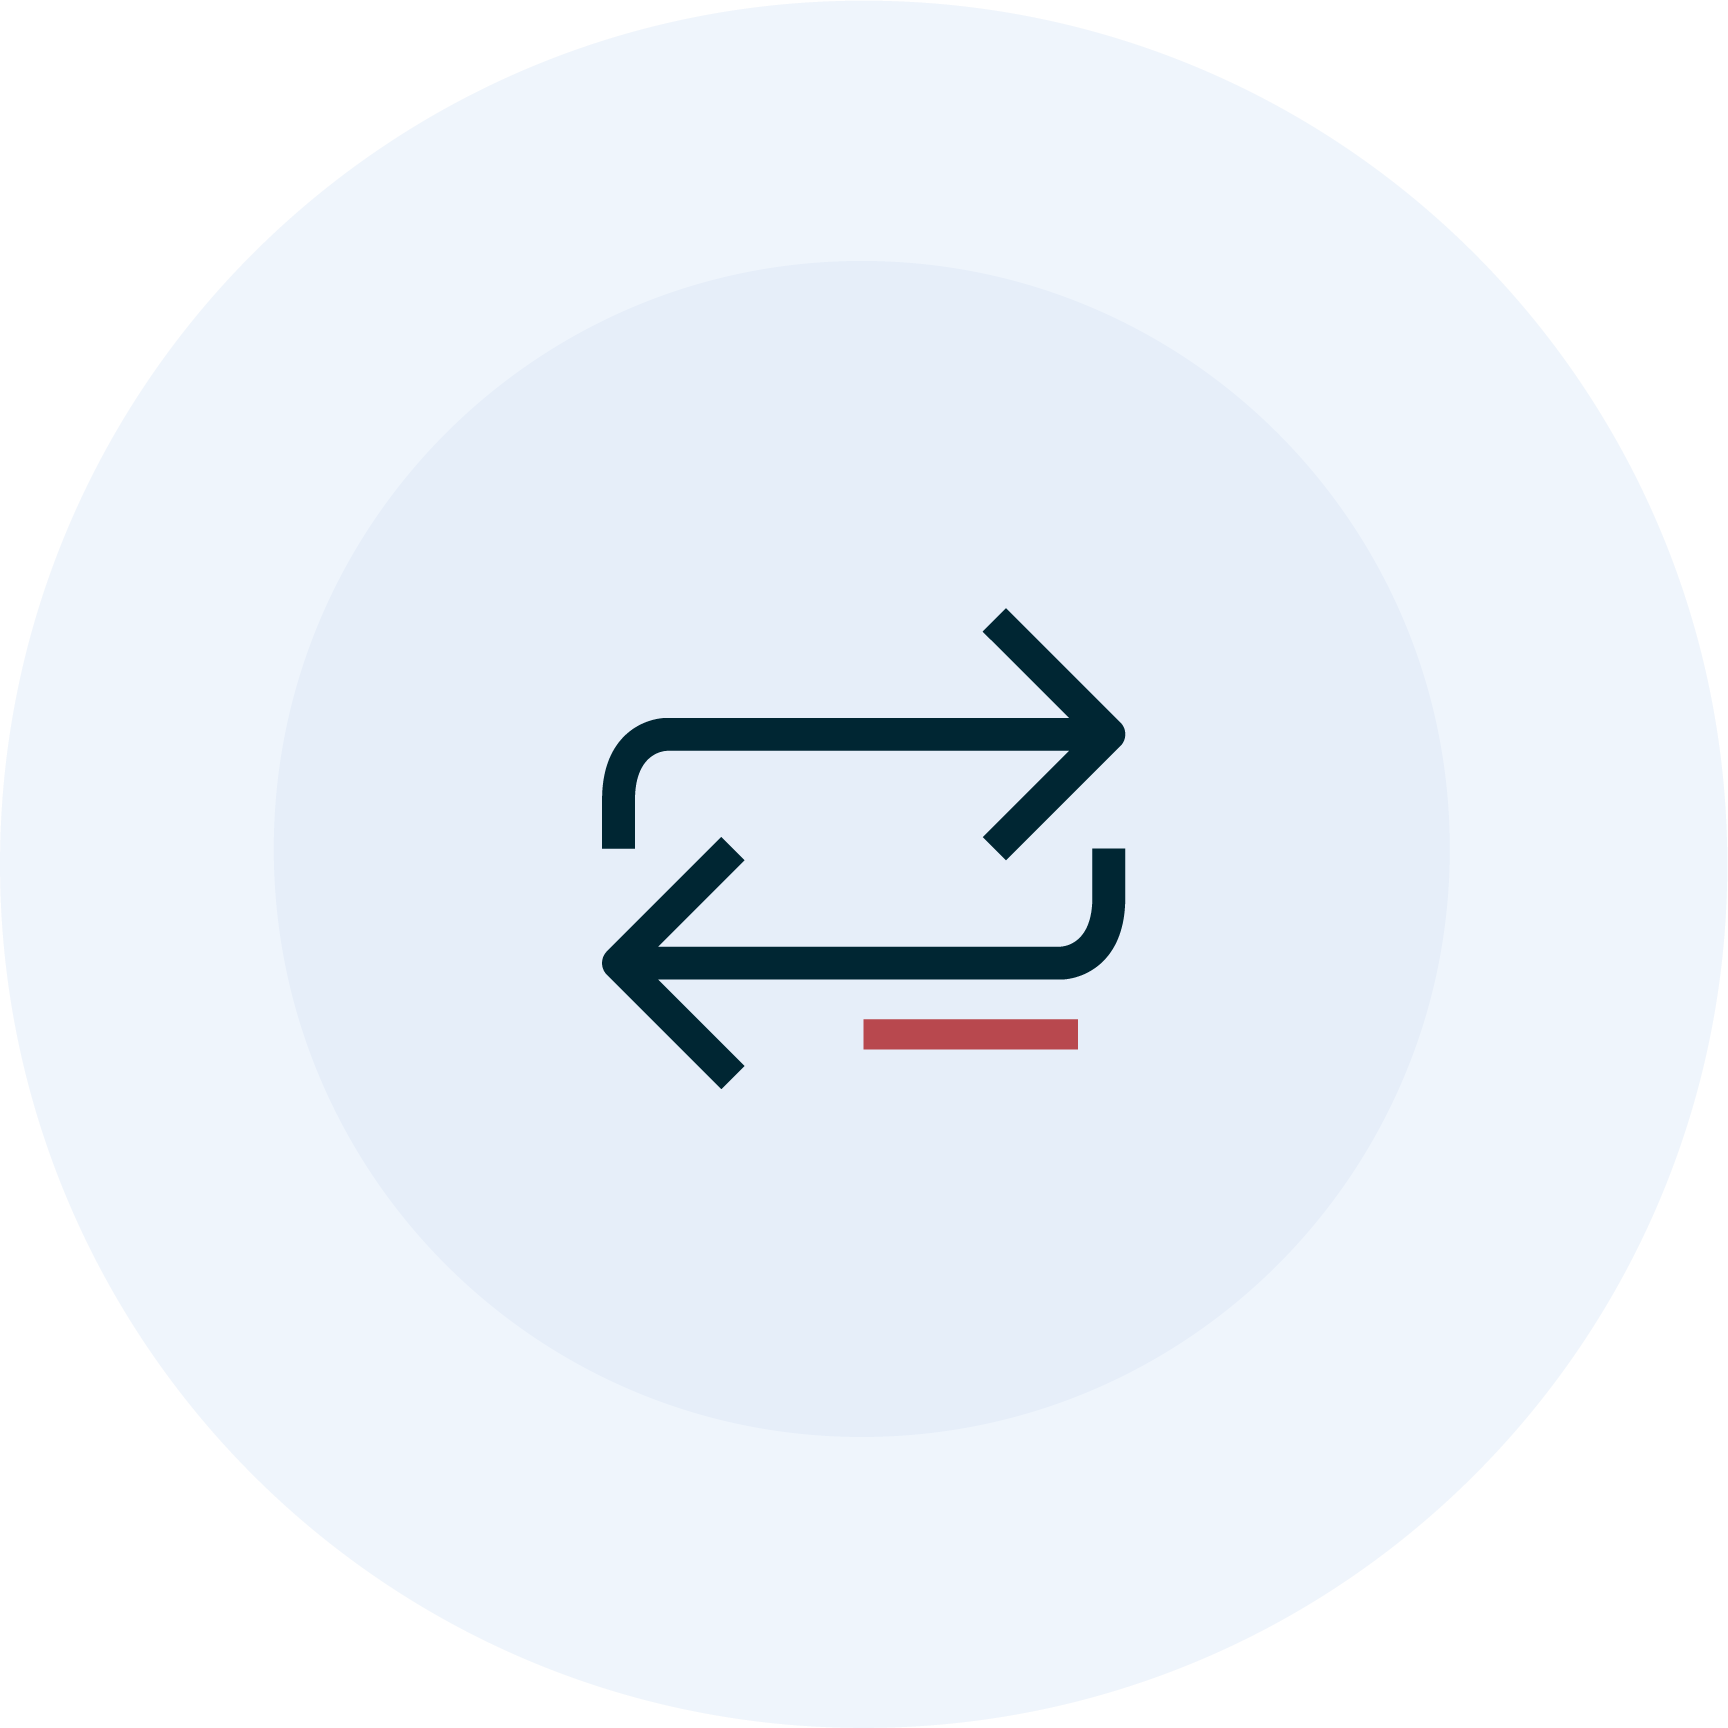 icon variation